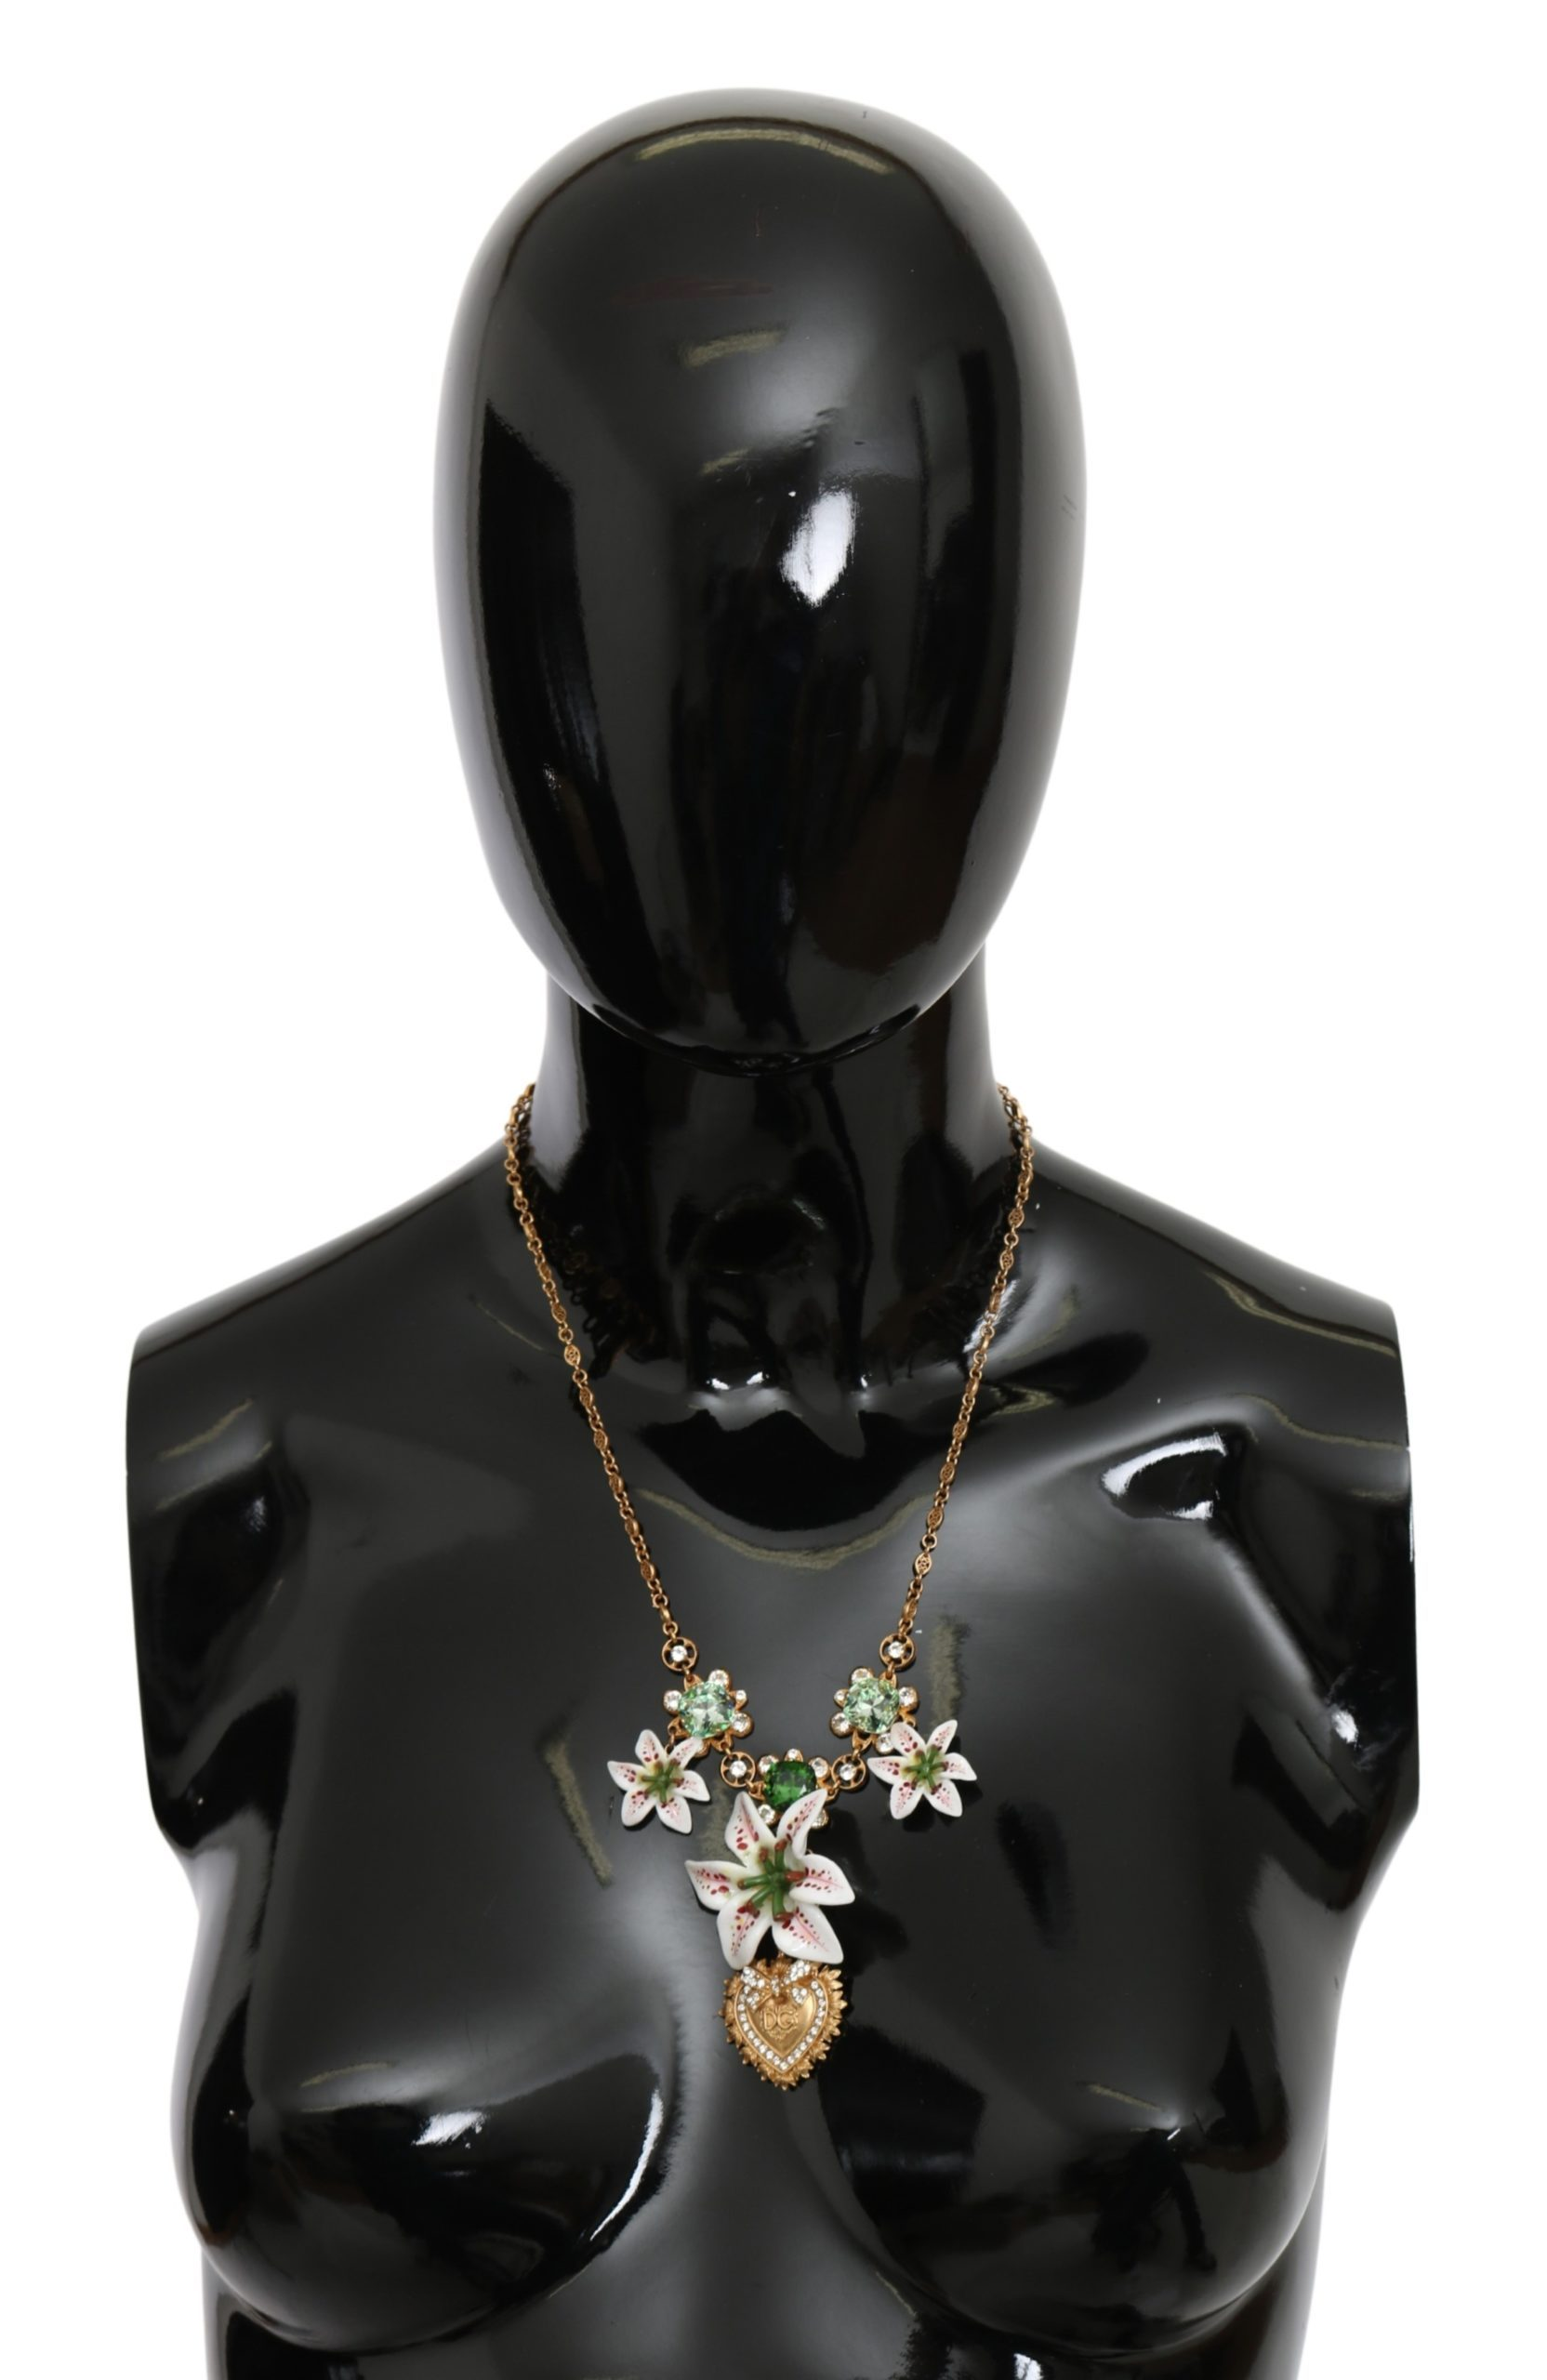 Dolce & Gabbana Women's Brass Sacred Heart Crystal Floral Necklace Gold SMY10072